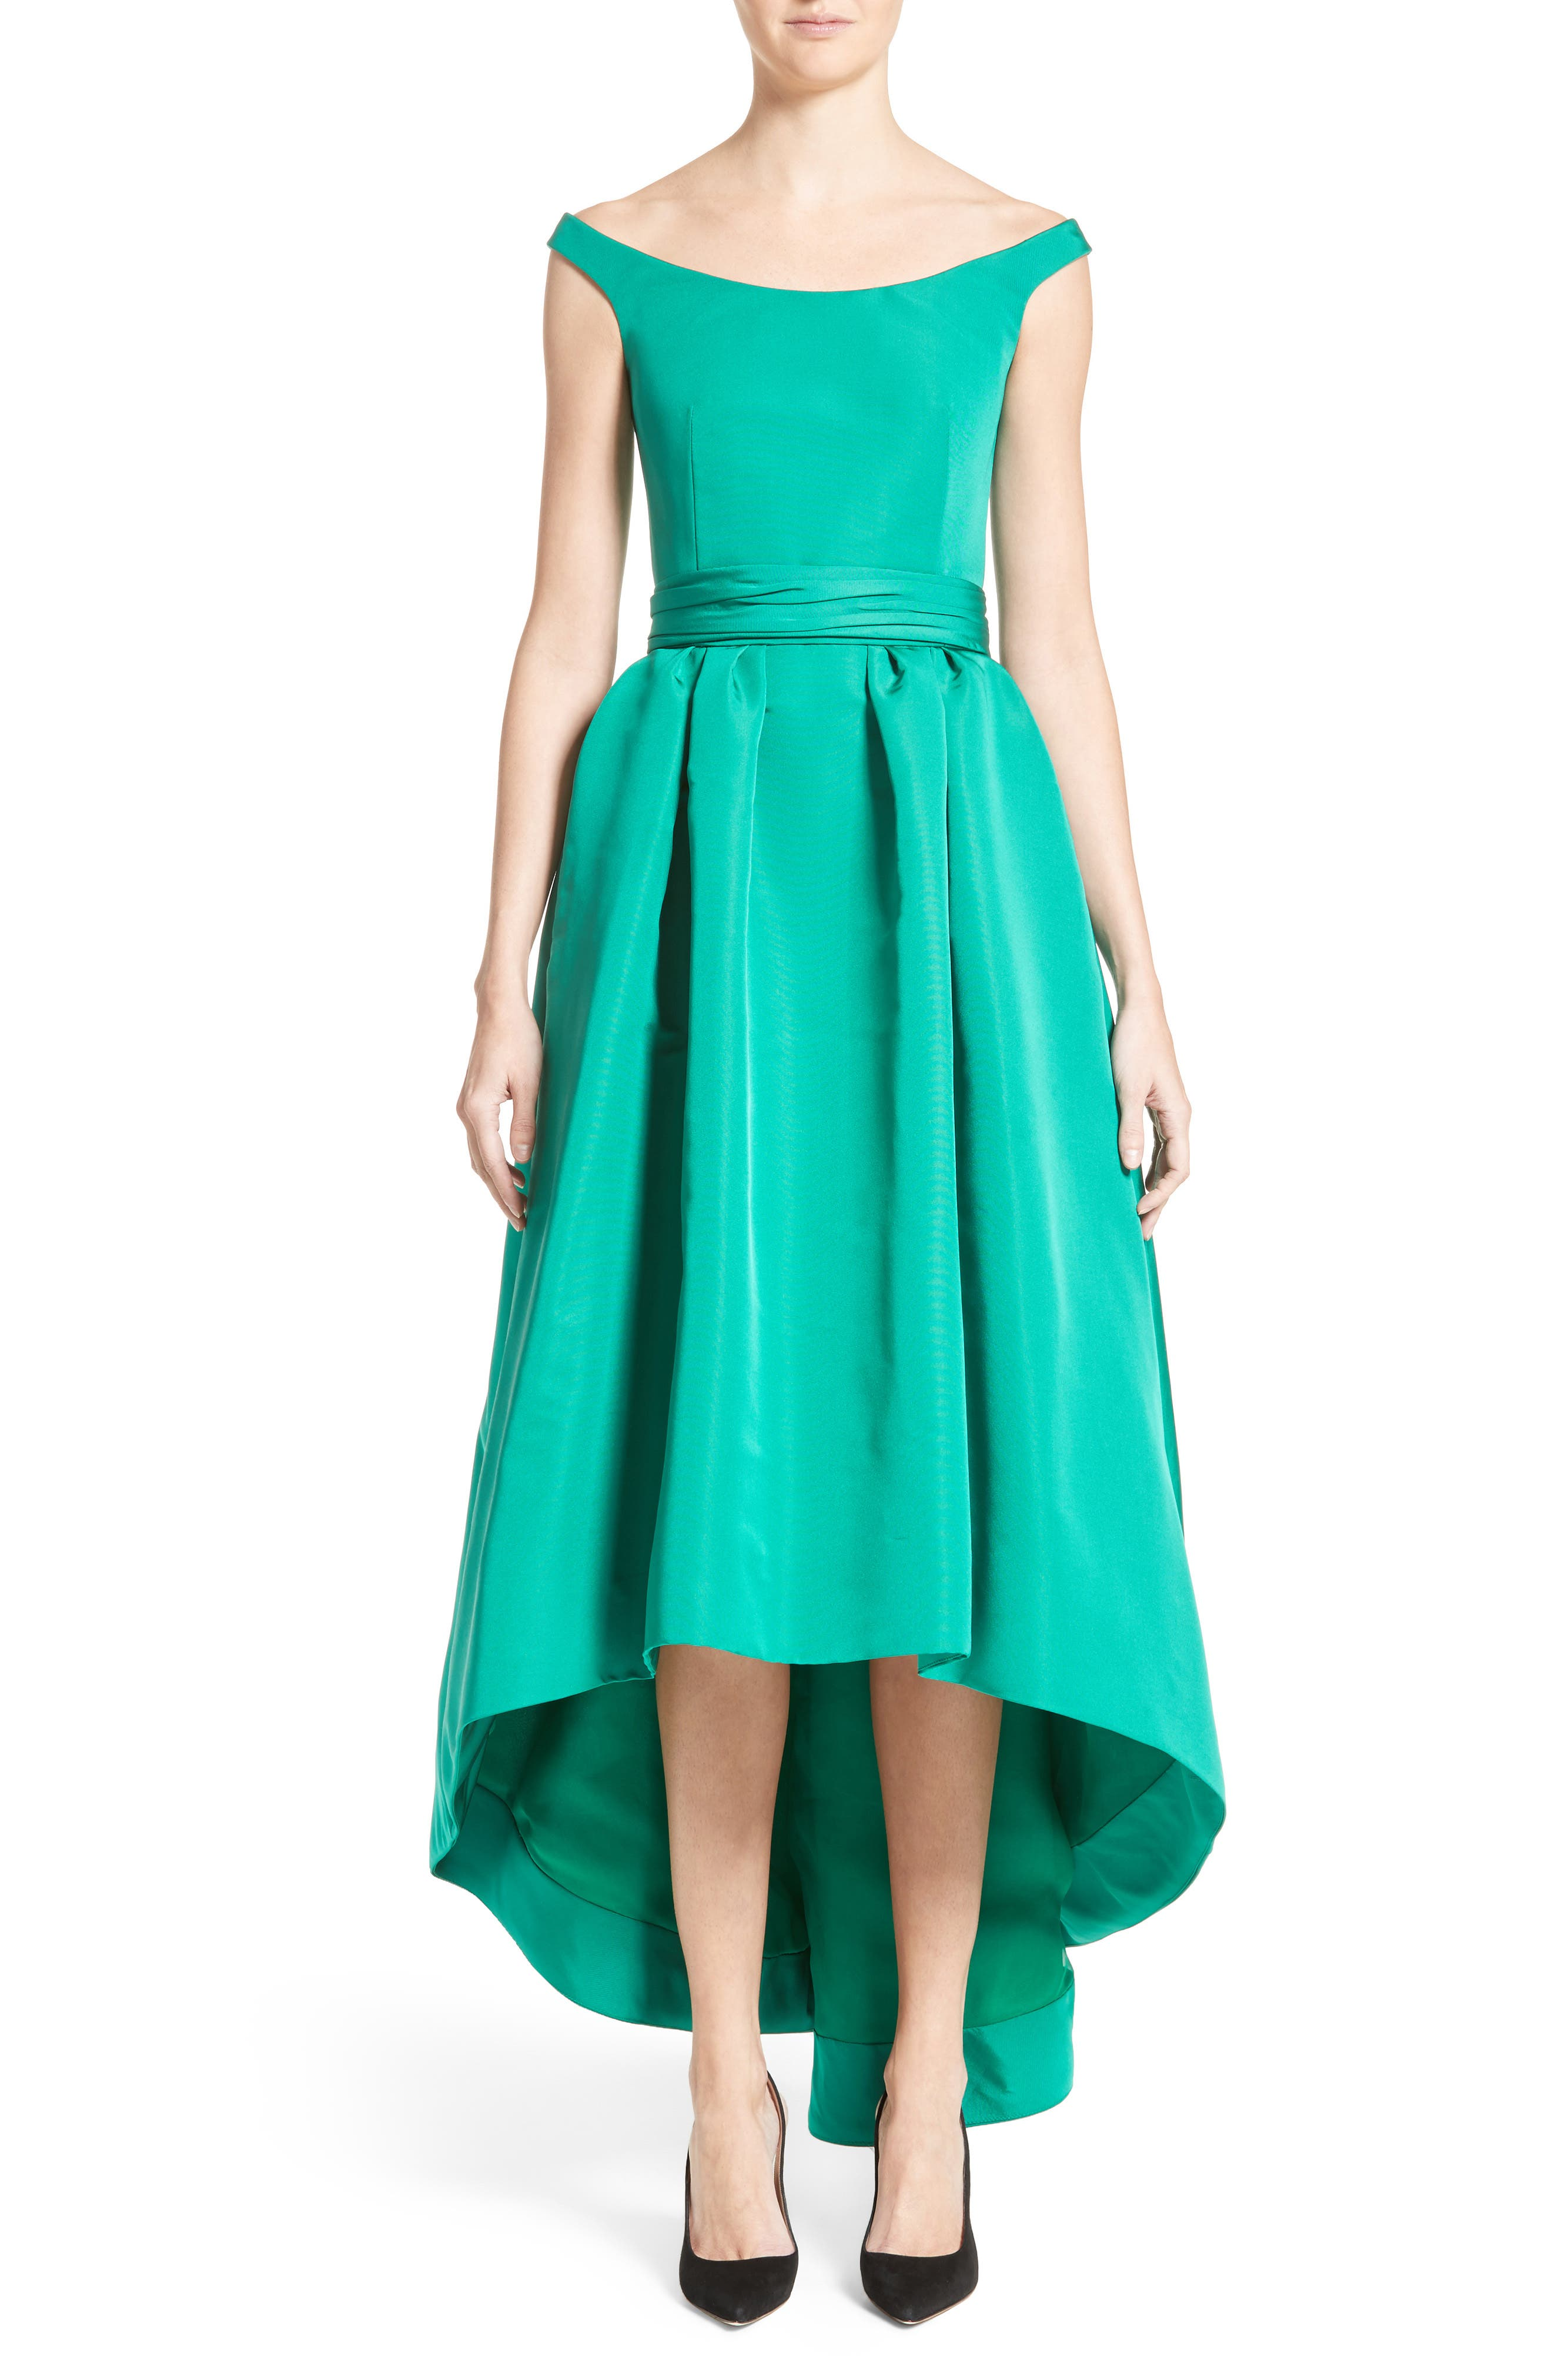 Alternate Image 1 Selected - Carolina Herrera Off the Shoulder Silk Faille Gown